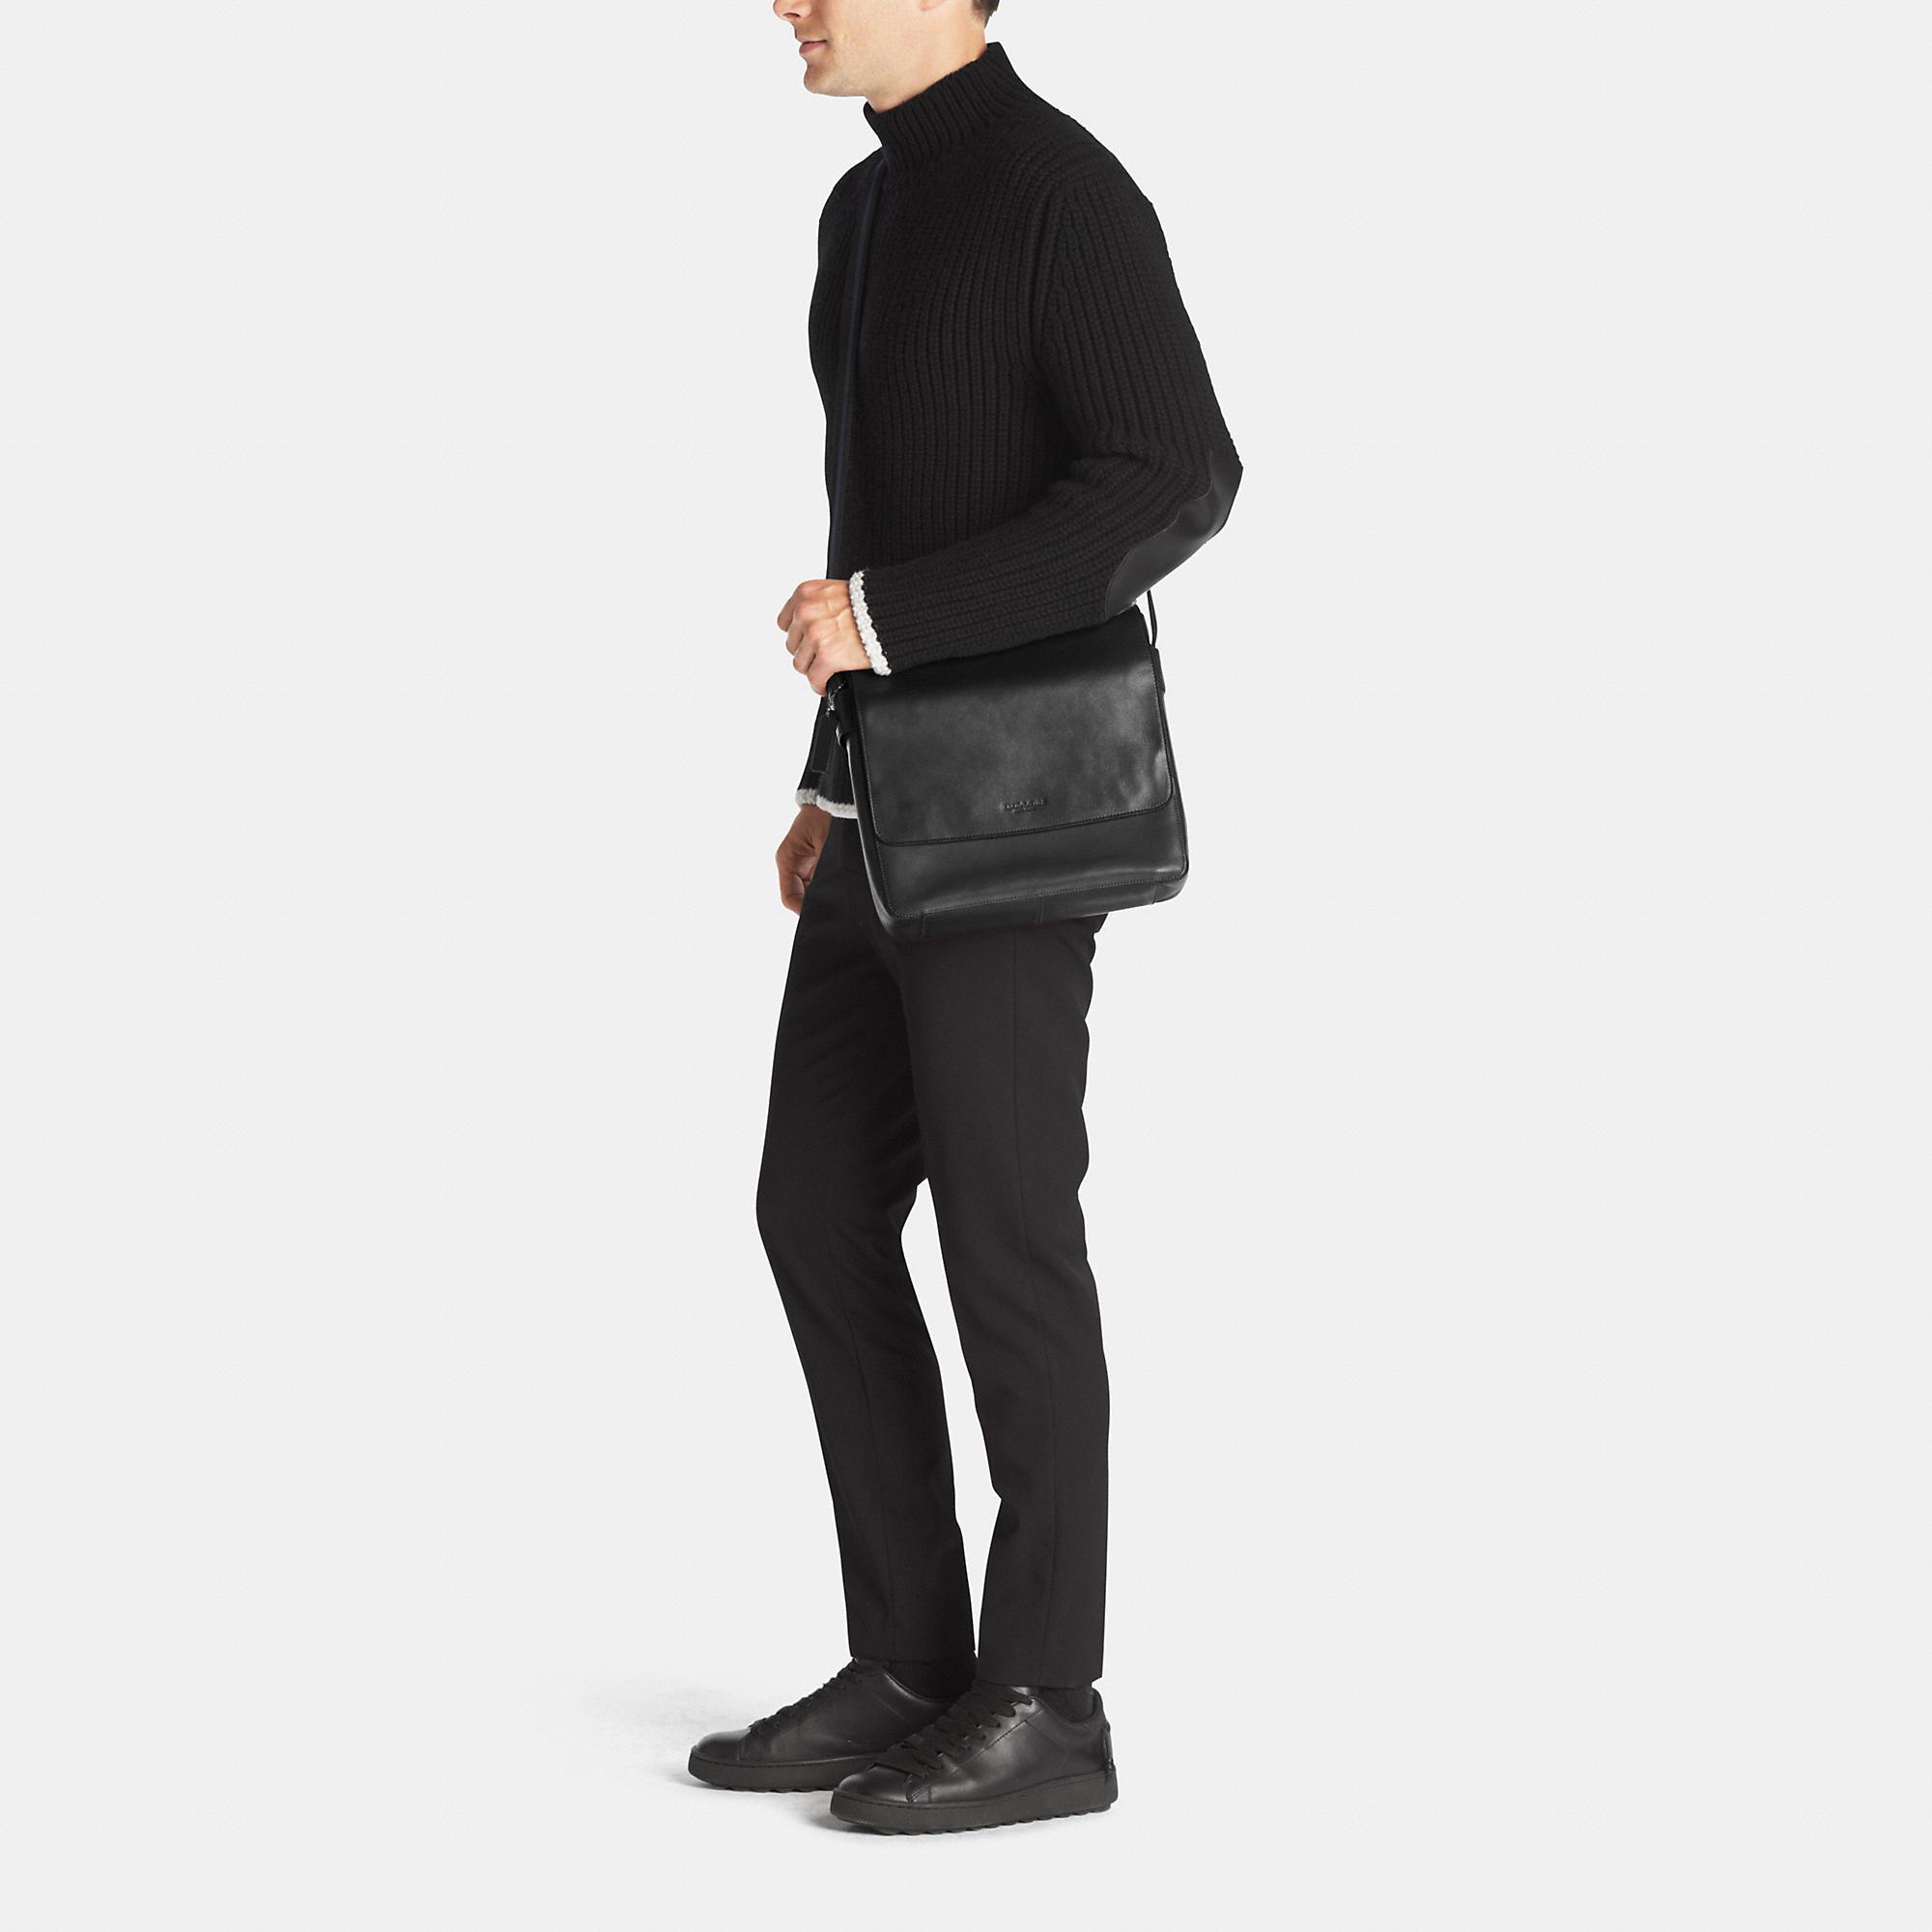 8bb2417ef COACH Metropolitan Map Bag In Sport Calf Leather in Black for Men - Lyst